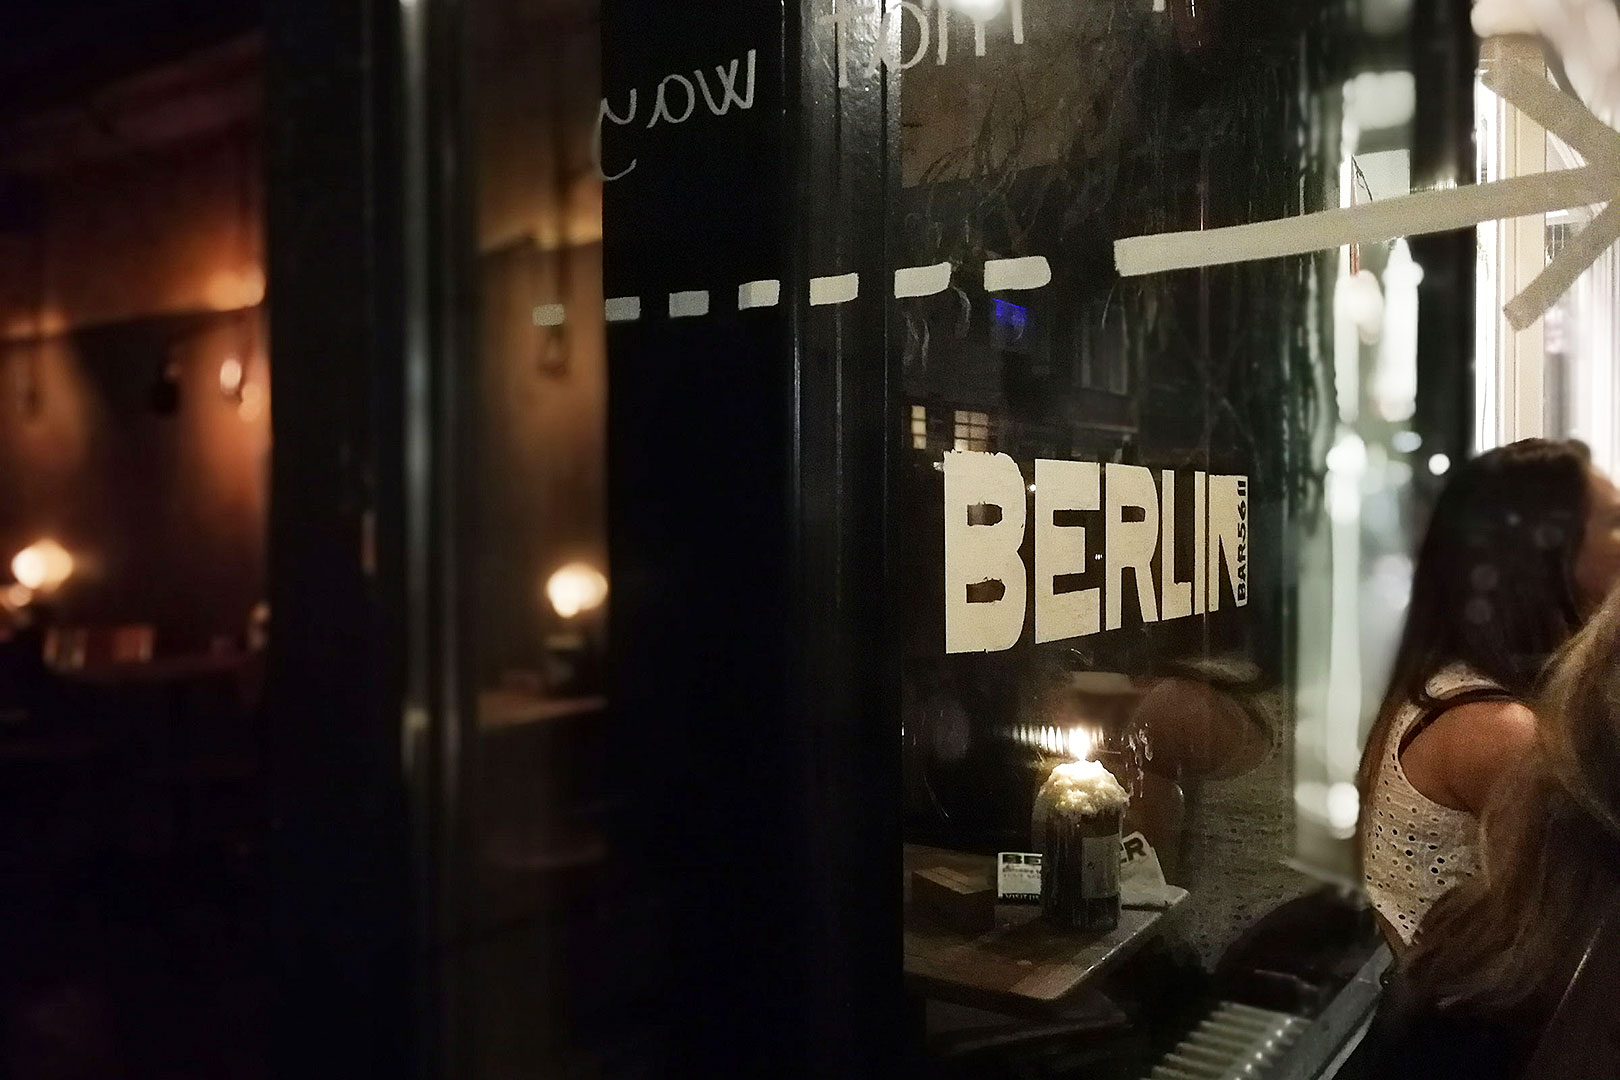 Bar Berlin